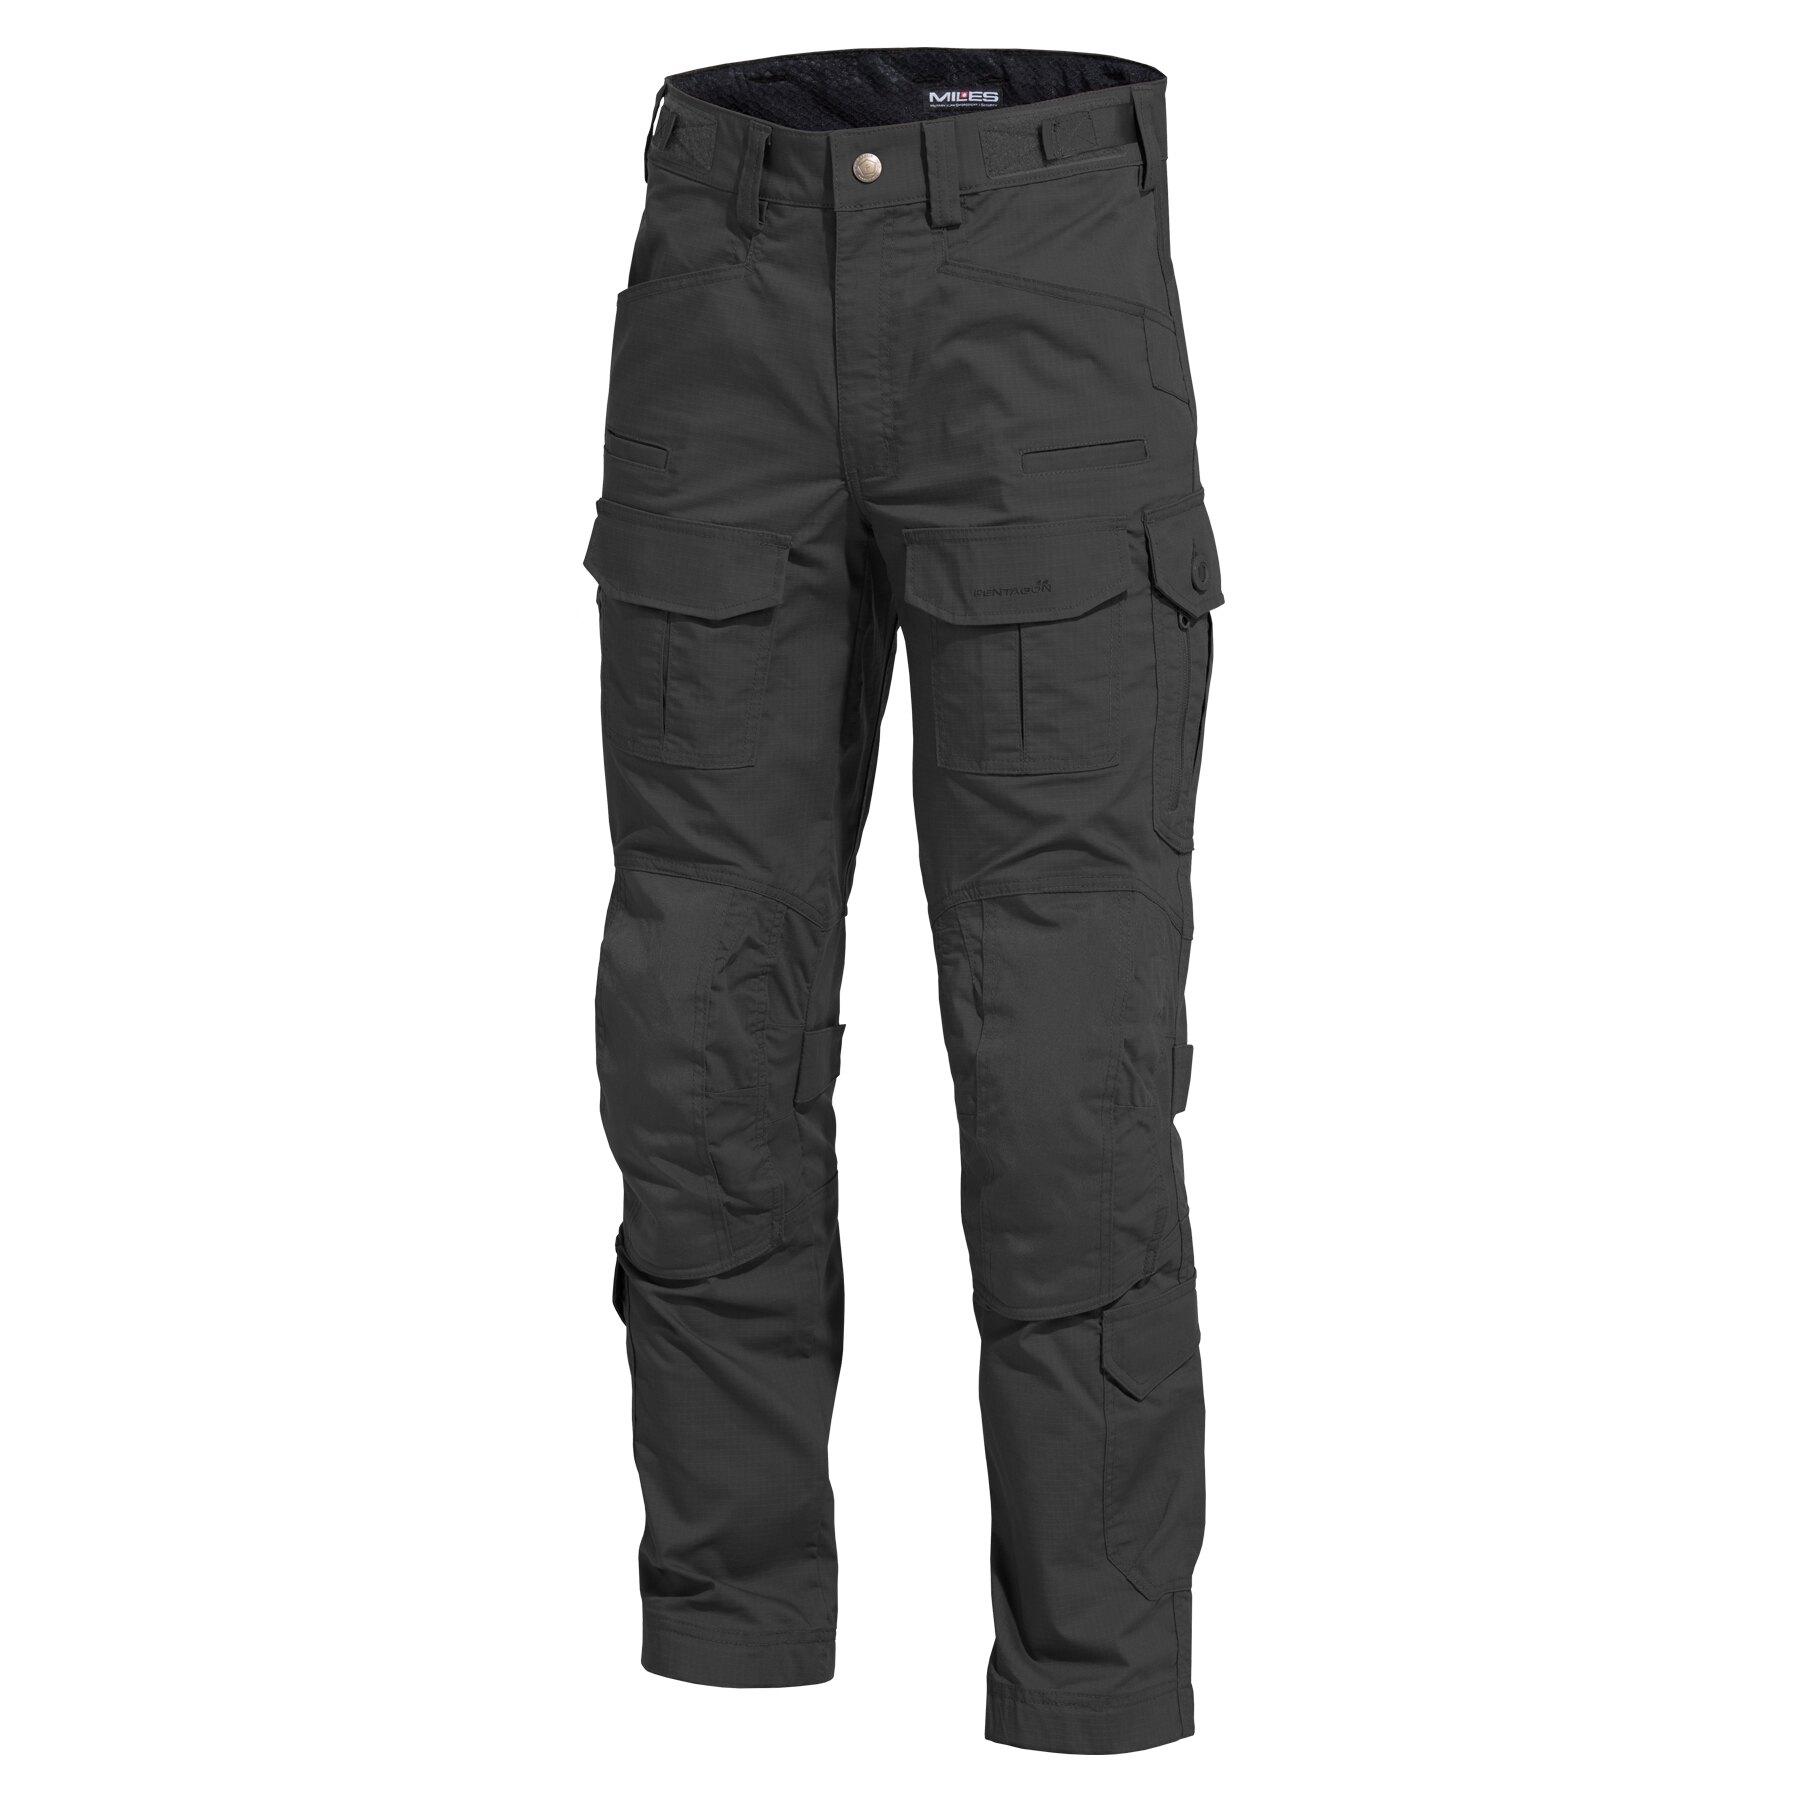 Nohavice PENTAGON® Wolf Combat - čierne (Veľkosť: 42)